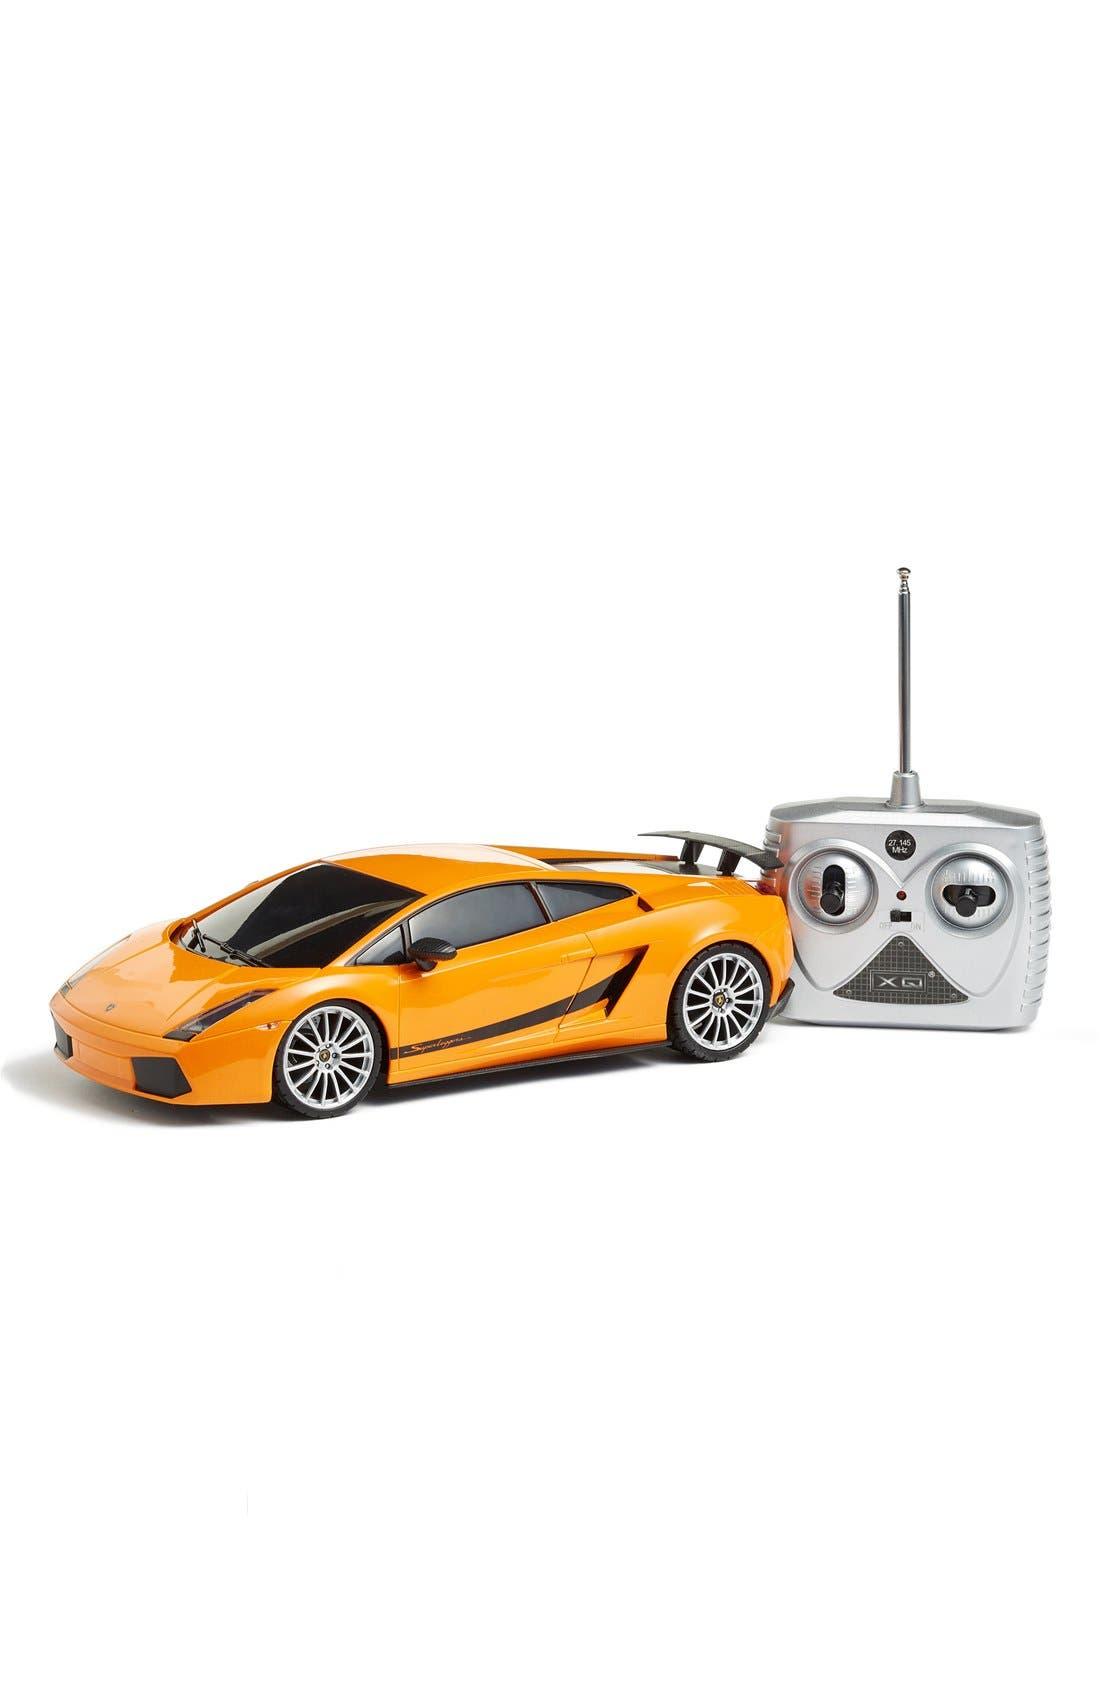 Lamborghini Superleggera 1:18 Scale Remote Control Car Toy,                         Main,                         color, 800